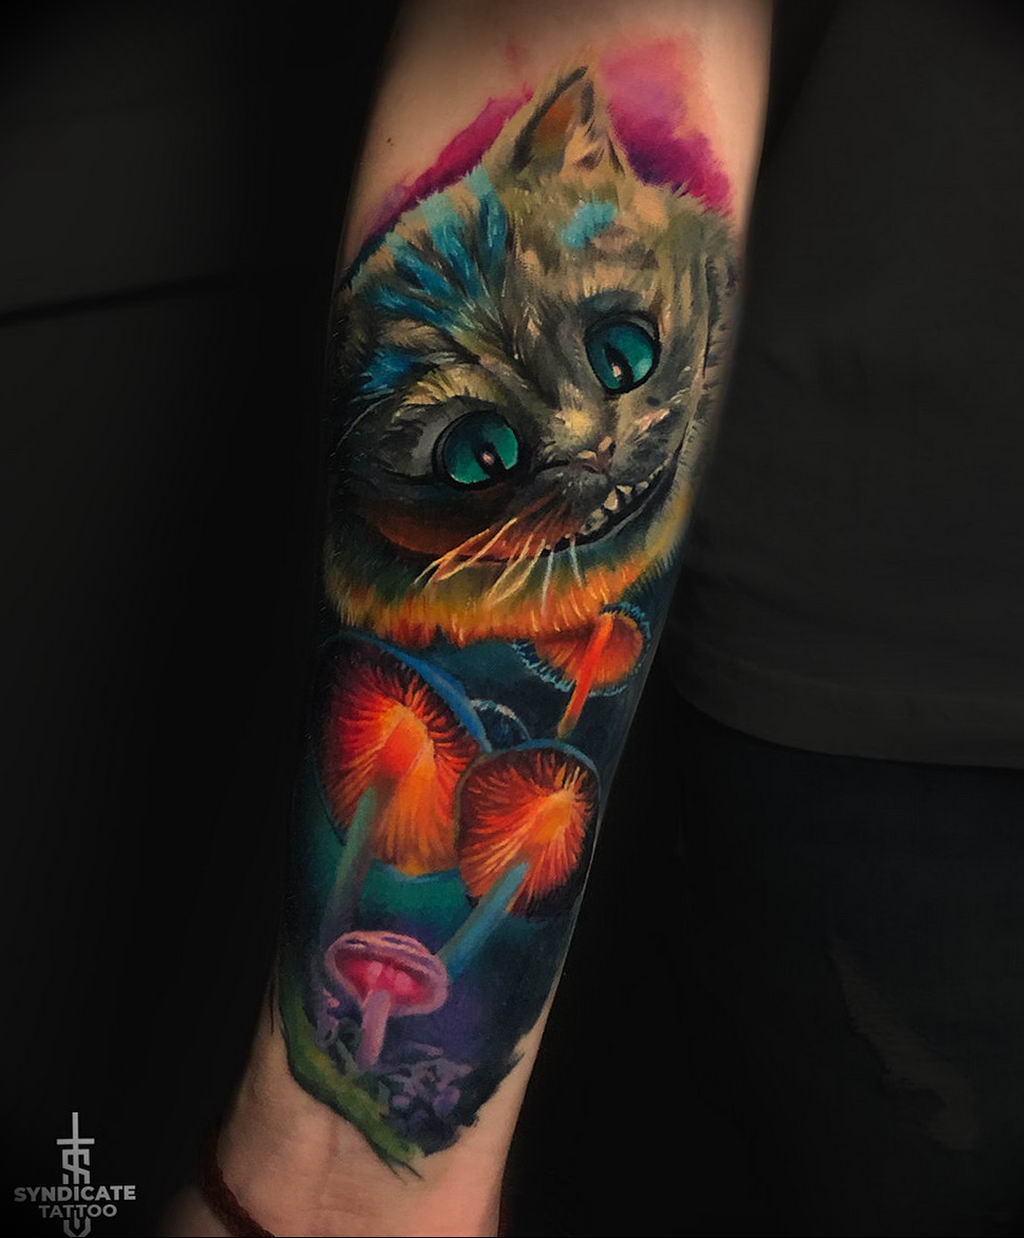 Фото тату студии Синдикат 09.09.2019 №129 - Syndicate tattoo - tatufoto.com